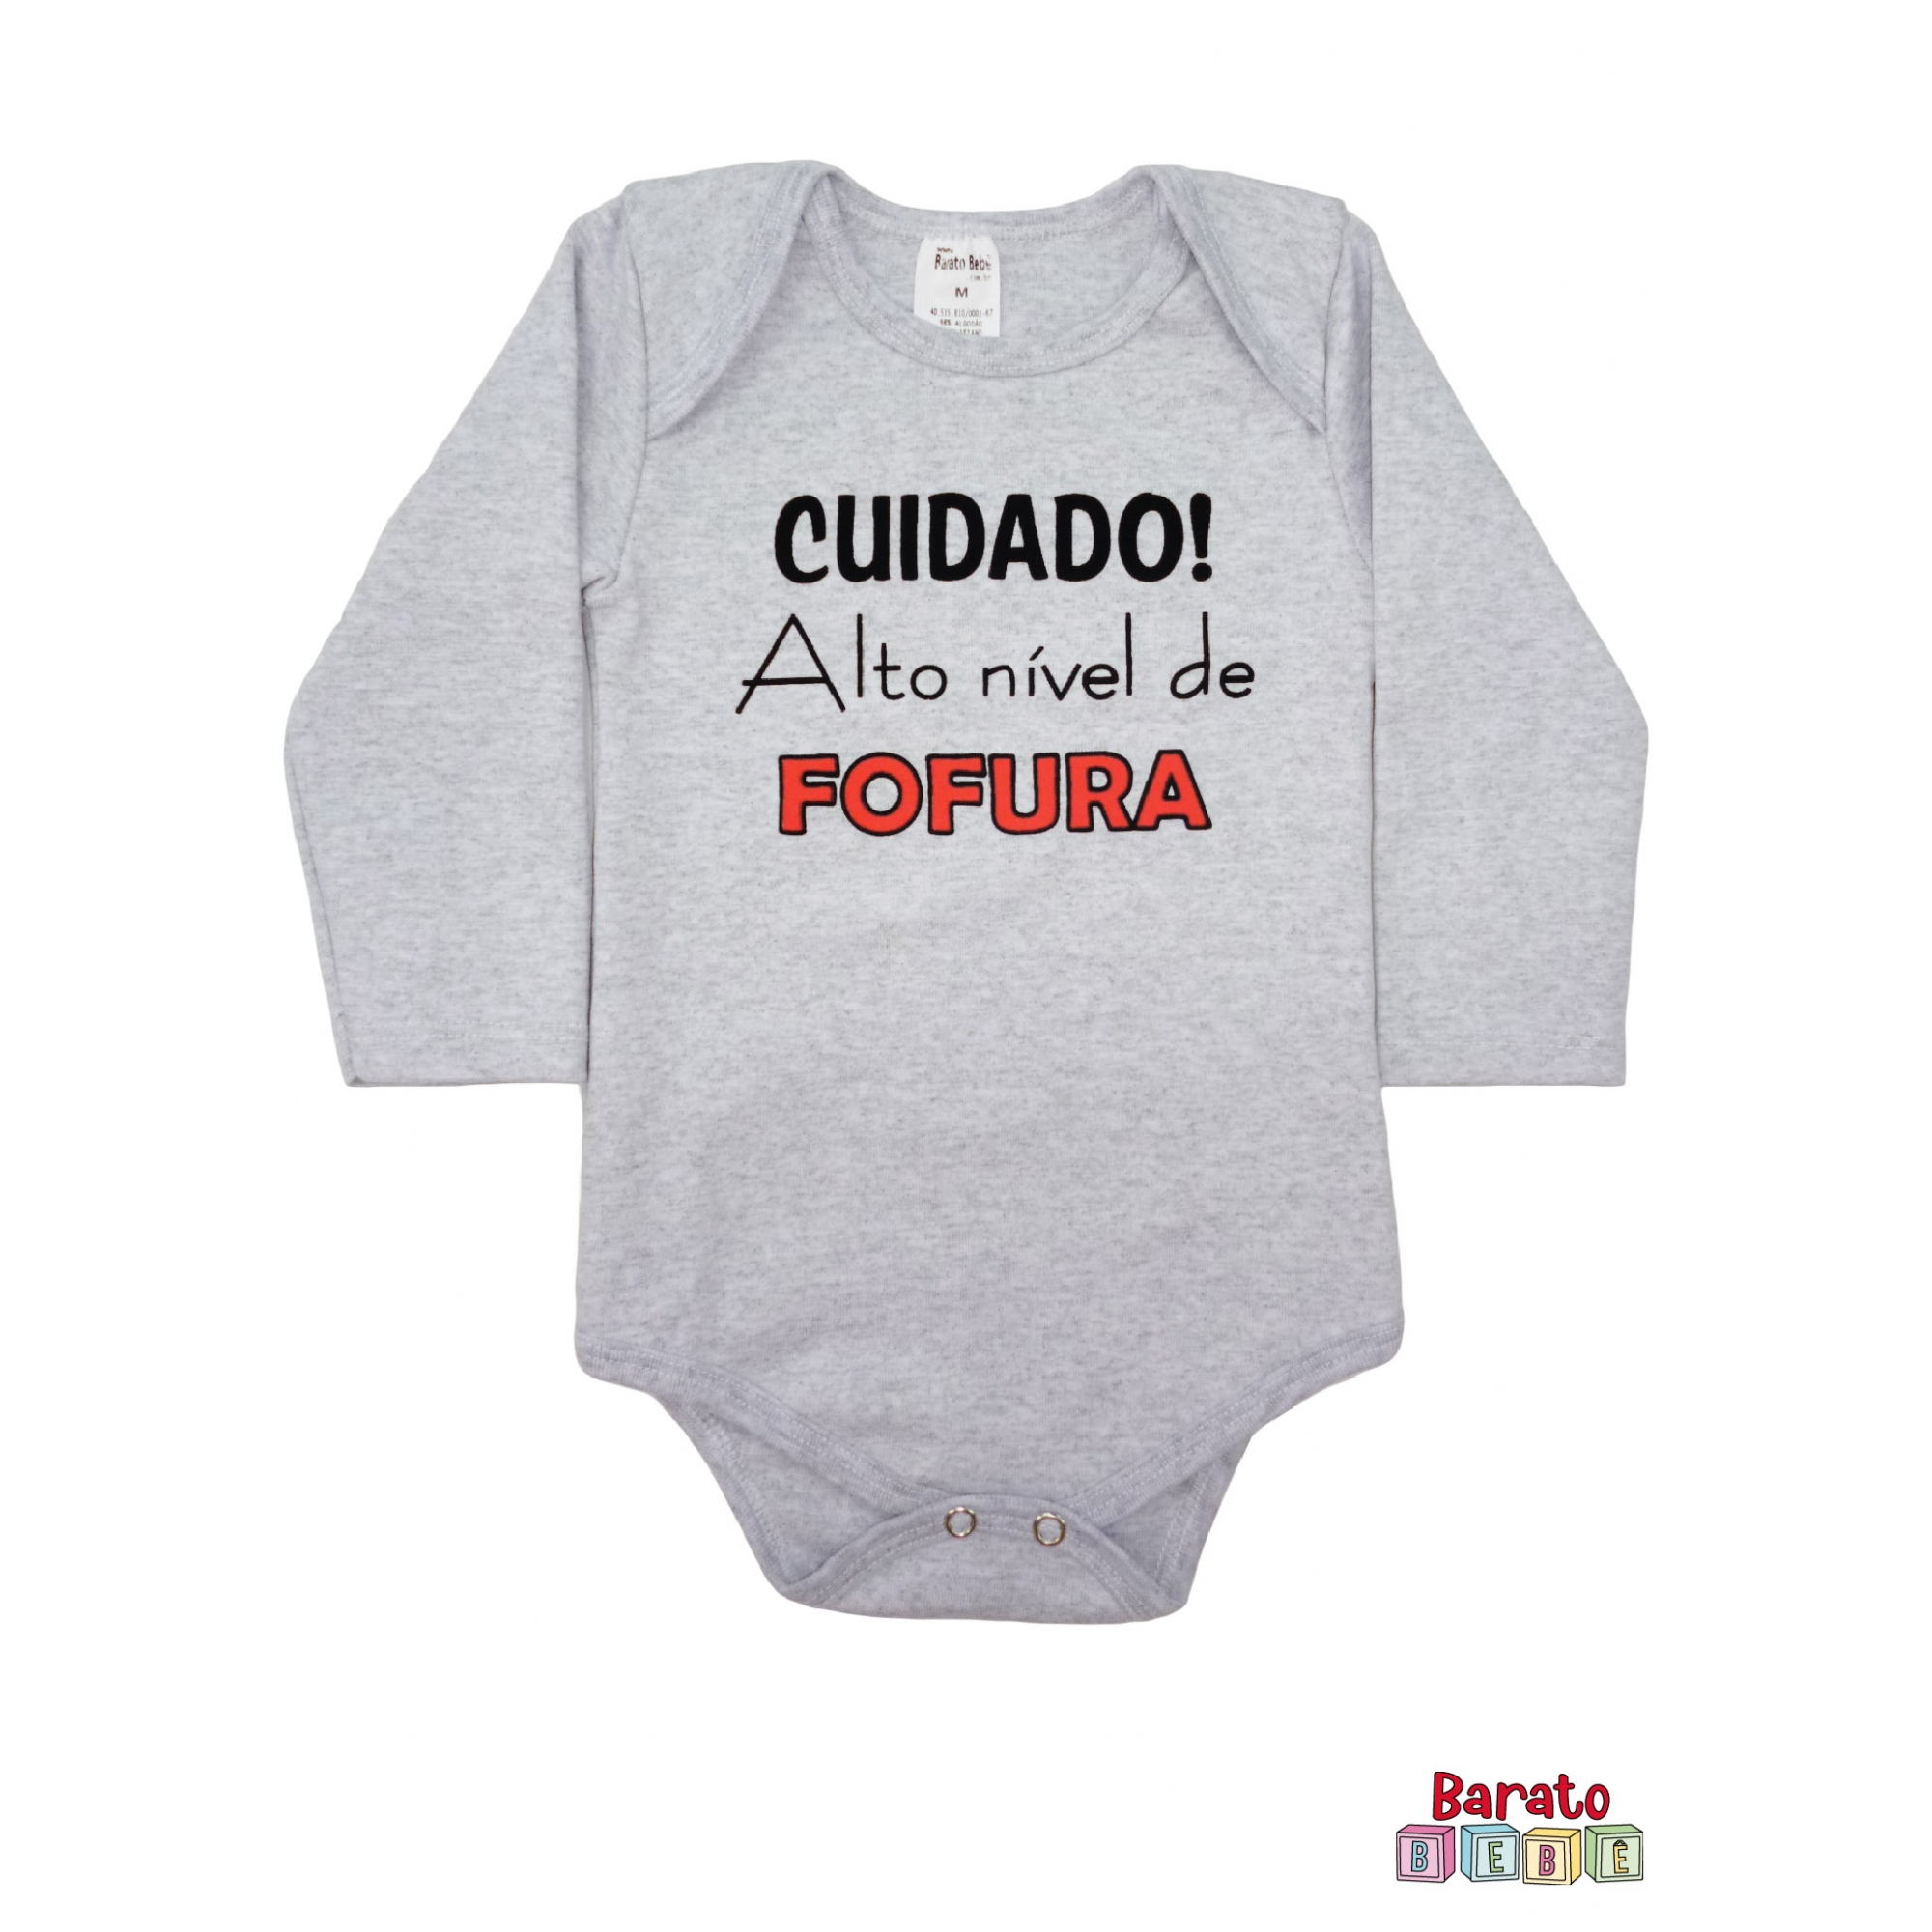 Body Bebê ML (P/M/G) - Cuidado! Alto Nível de Fofura - Barato Bebê - Mescla